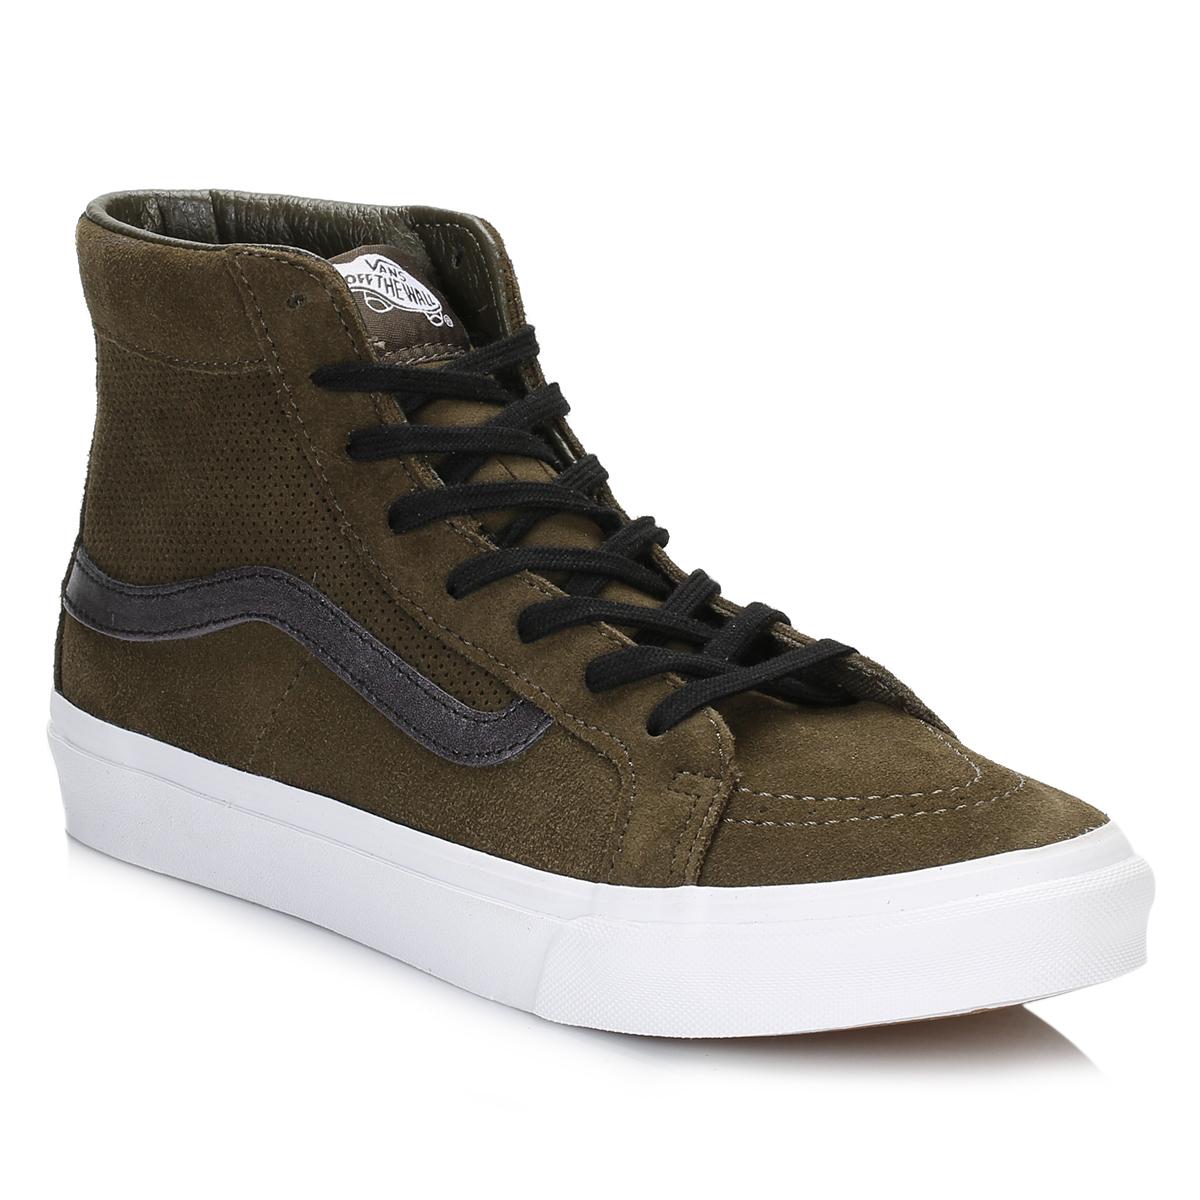 Khaki Vans Shoes Womens